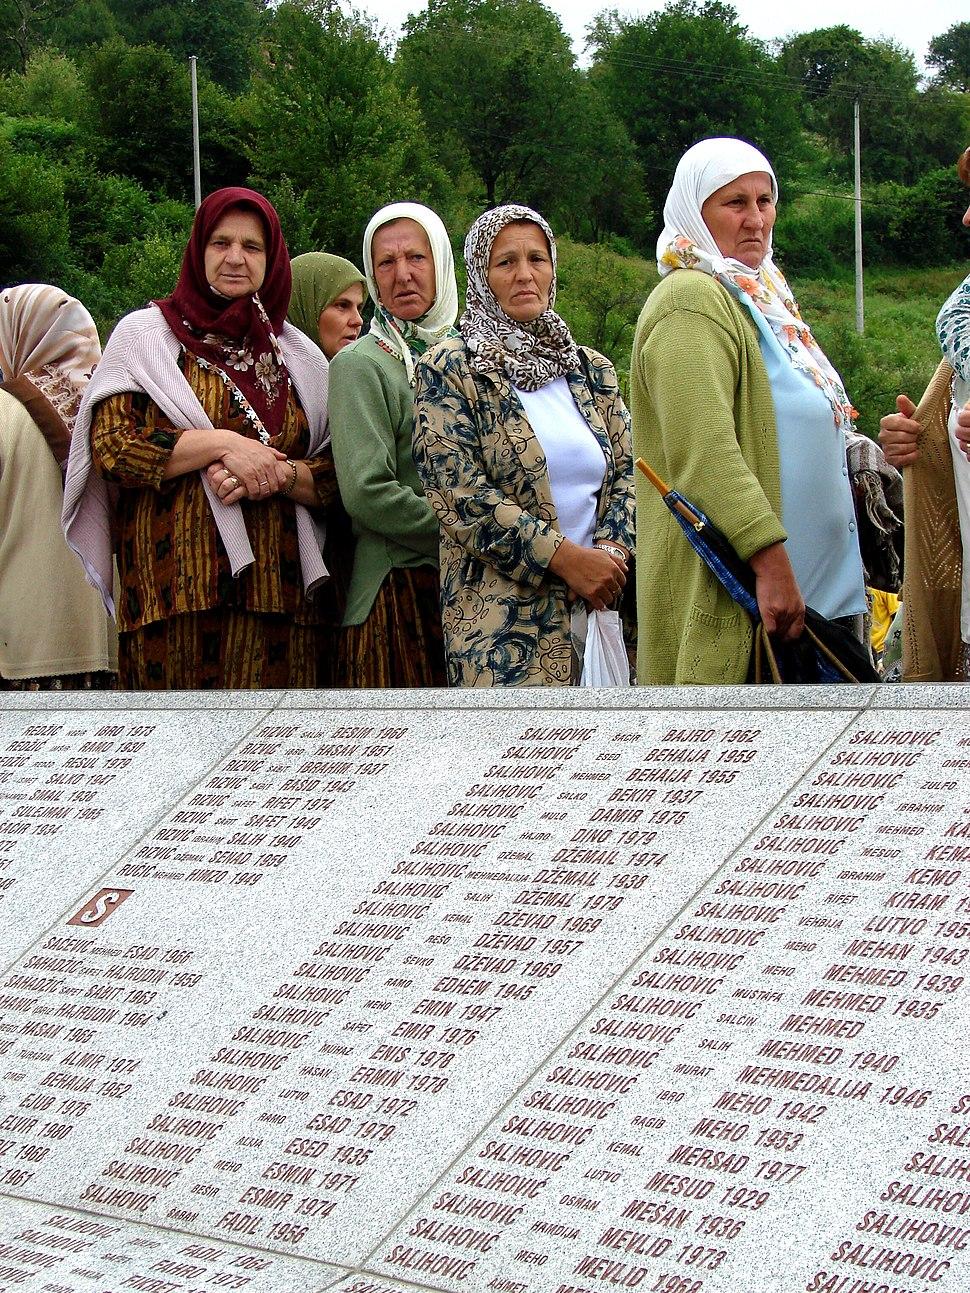 Srebrenica Massacre - Reinterment and Memorial Ceremony - July 2007 - Women and Monument